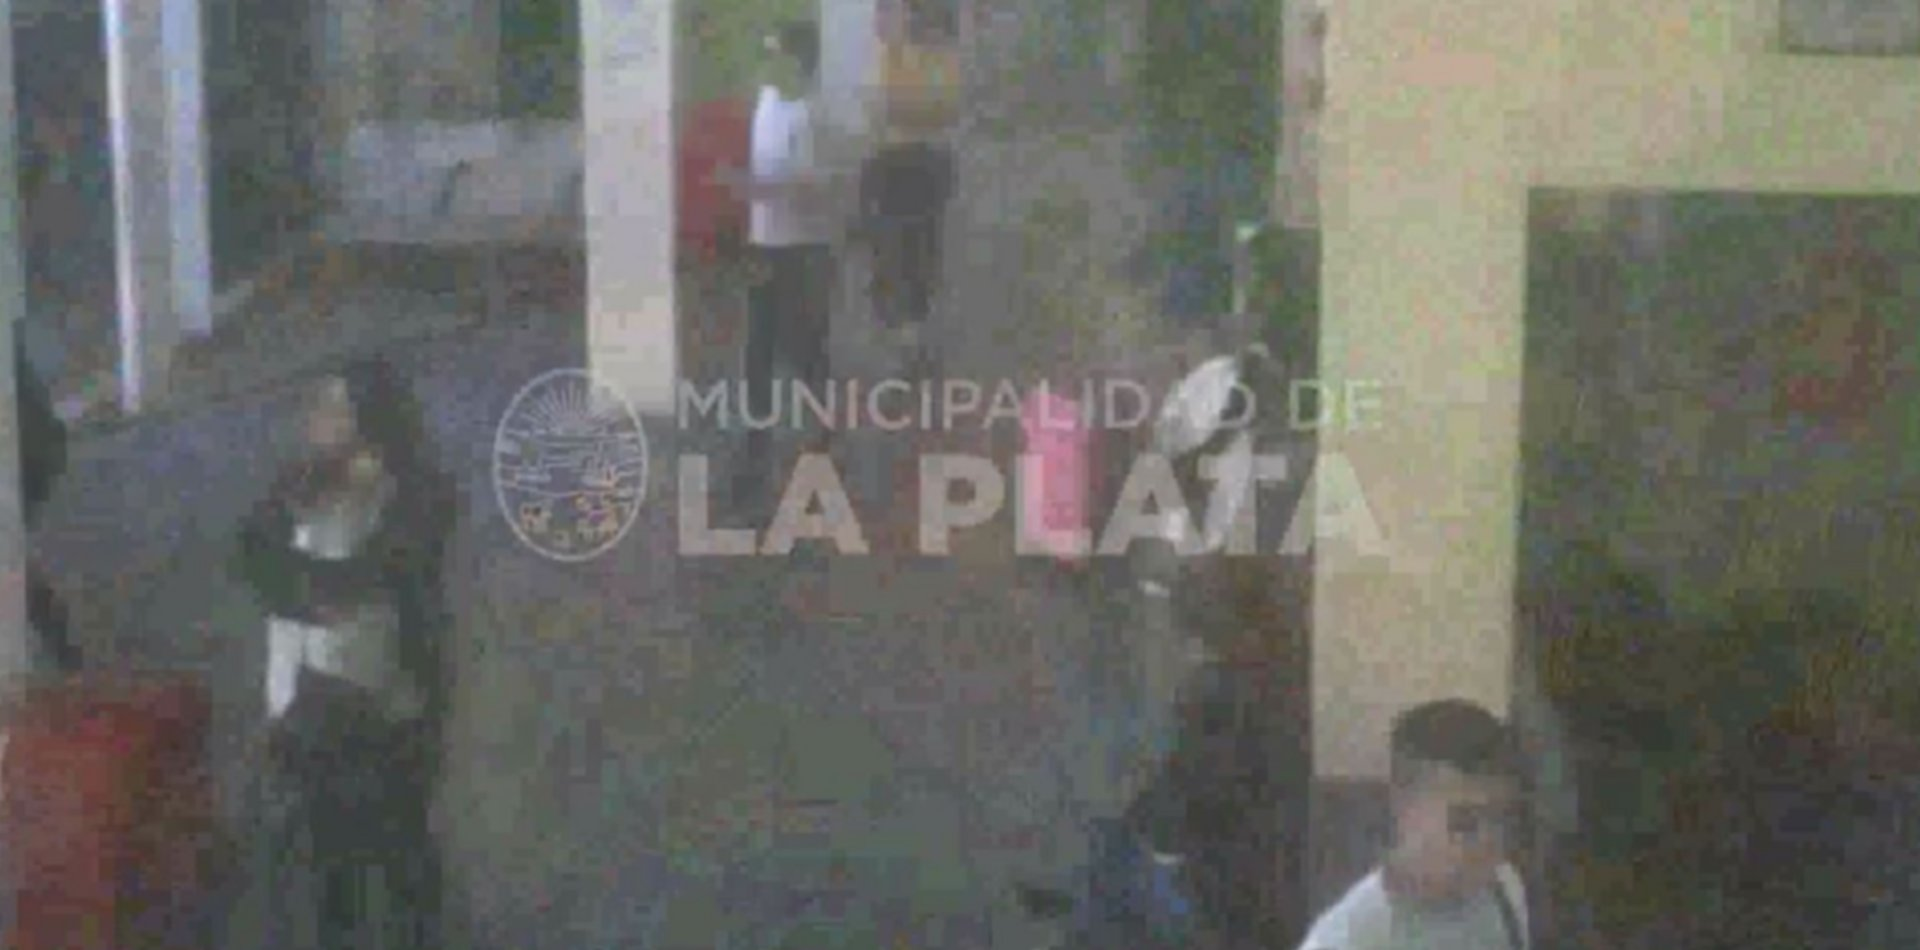 VIDEO: ¿Sandra Sepúlveda estuvo en la Terminal de La Plata o no?